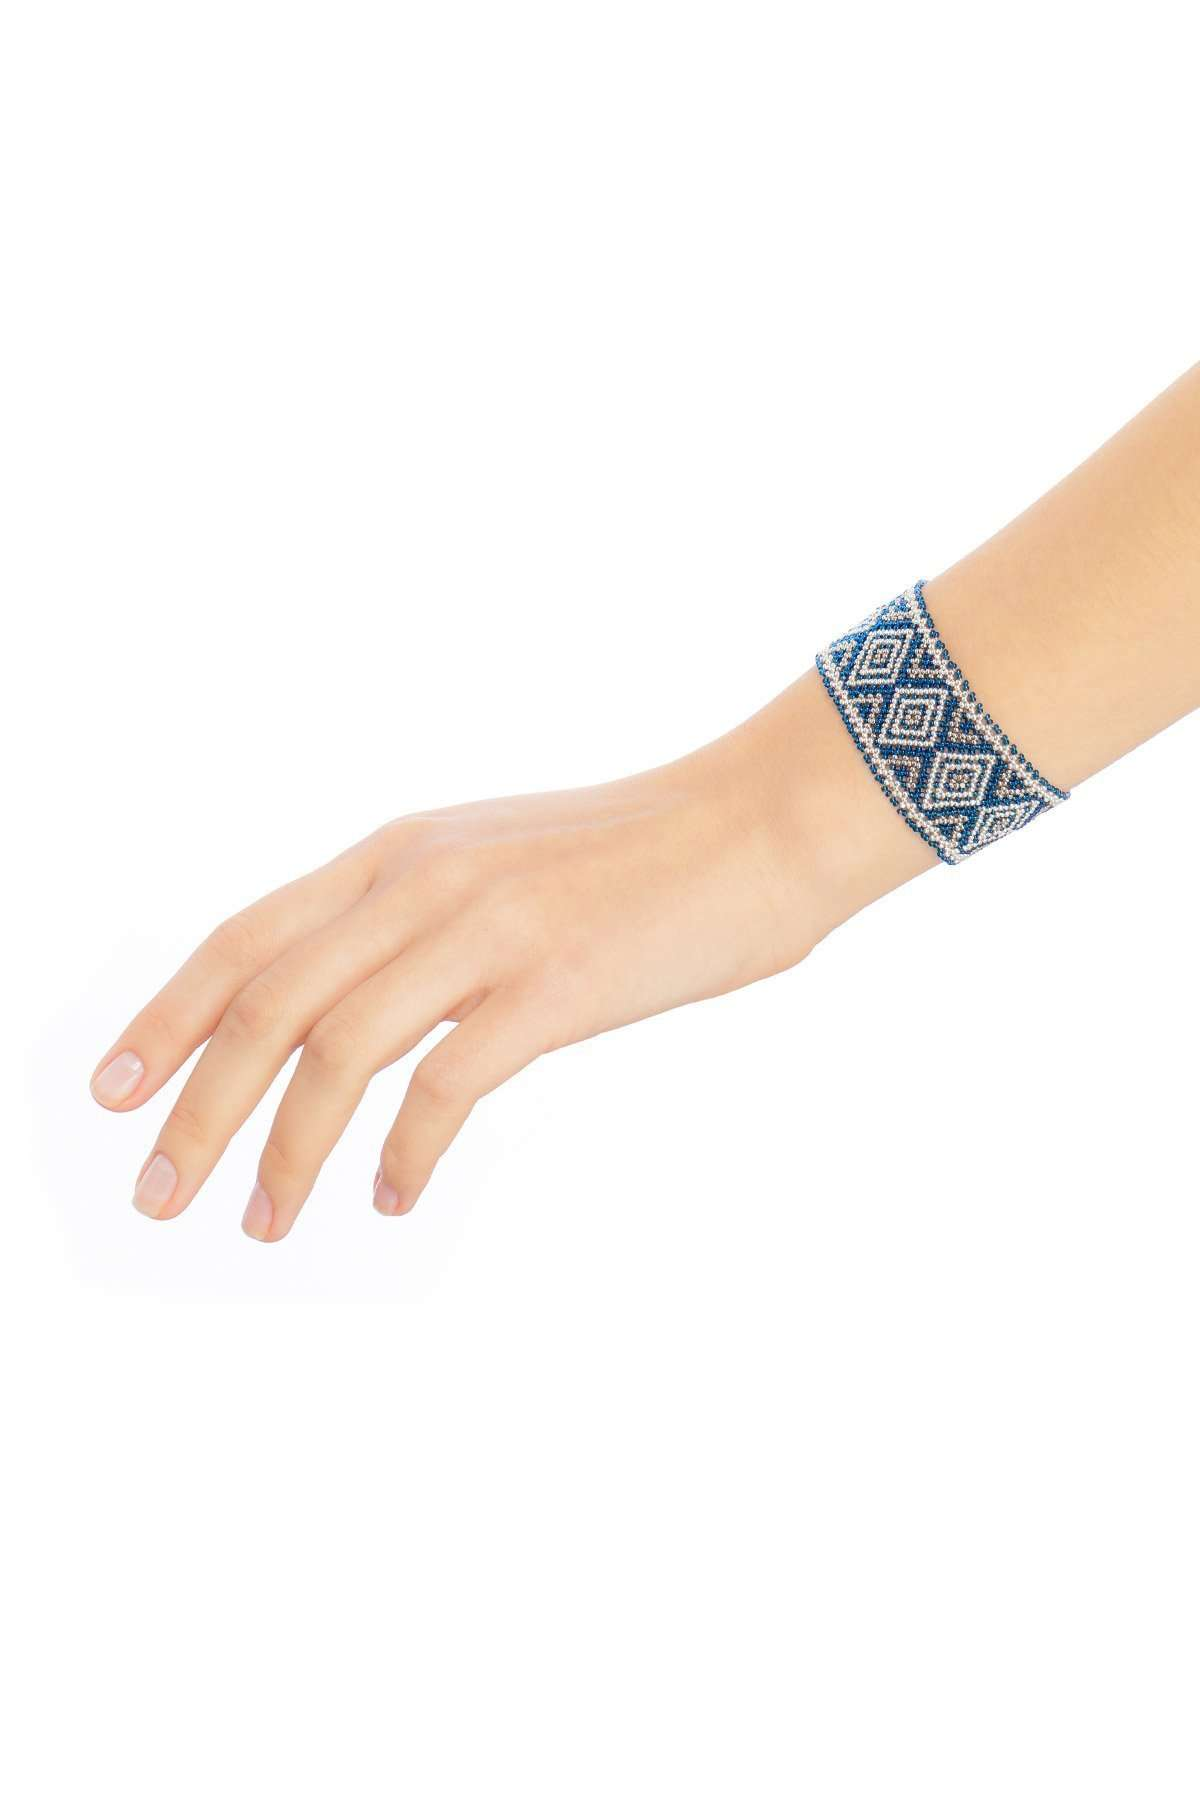 004-brazaletes-mediano-plata-platino-azul-alt1